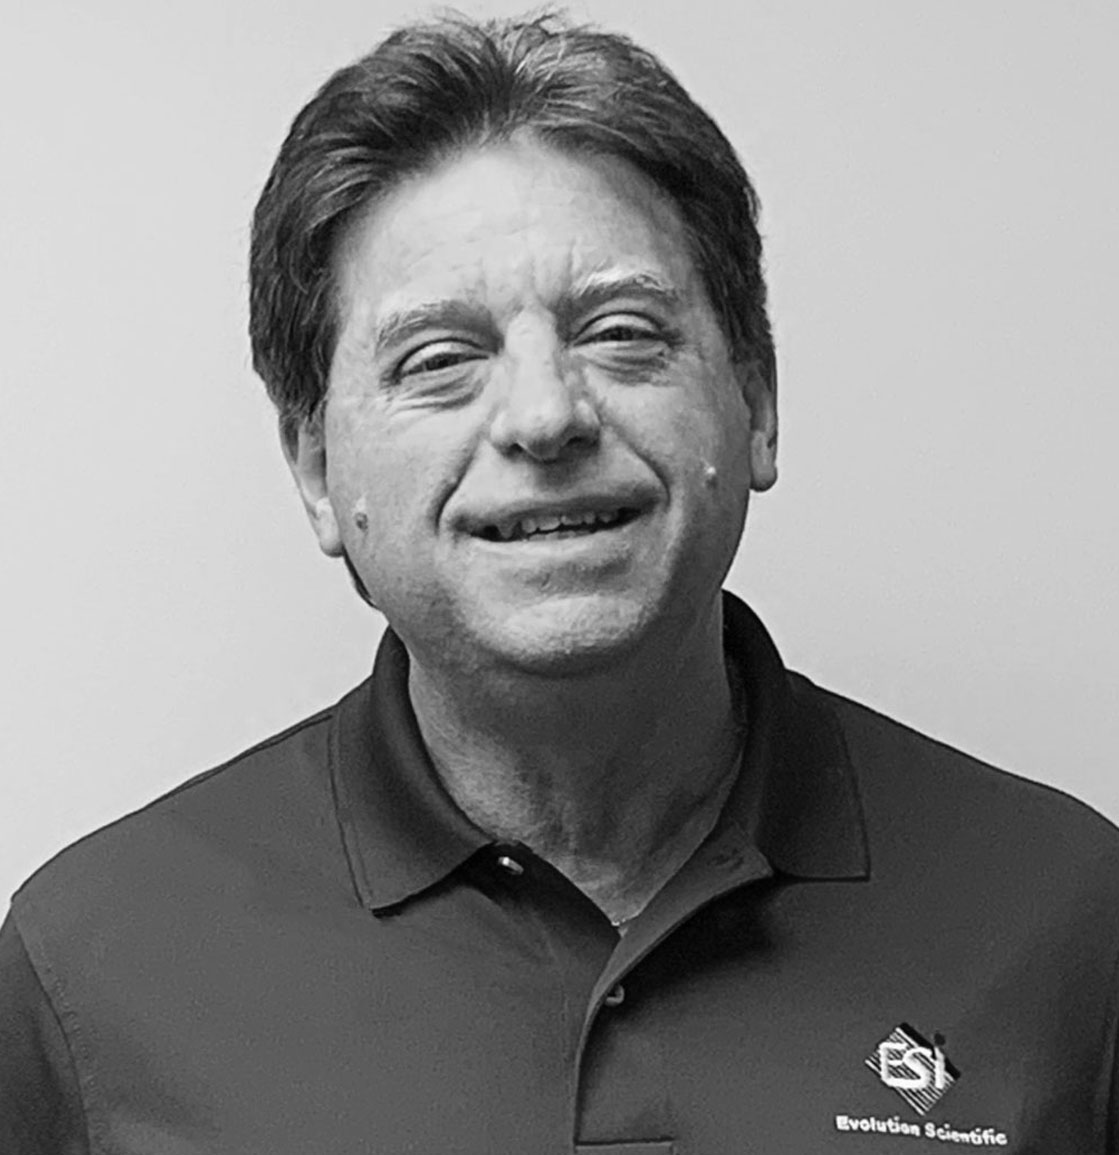 Tony Pileggi, ESi's Quality Assurance Manager